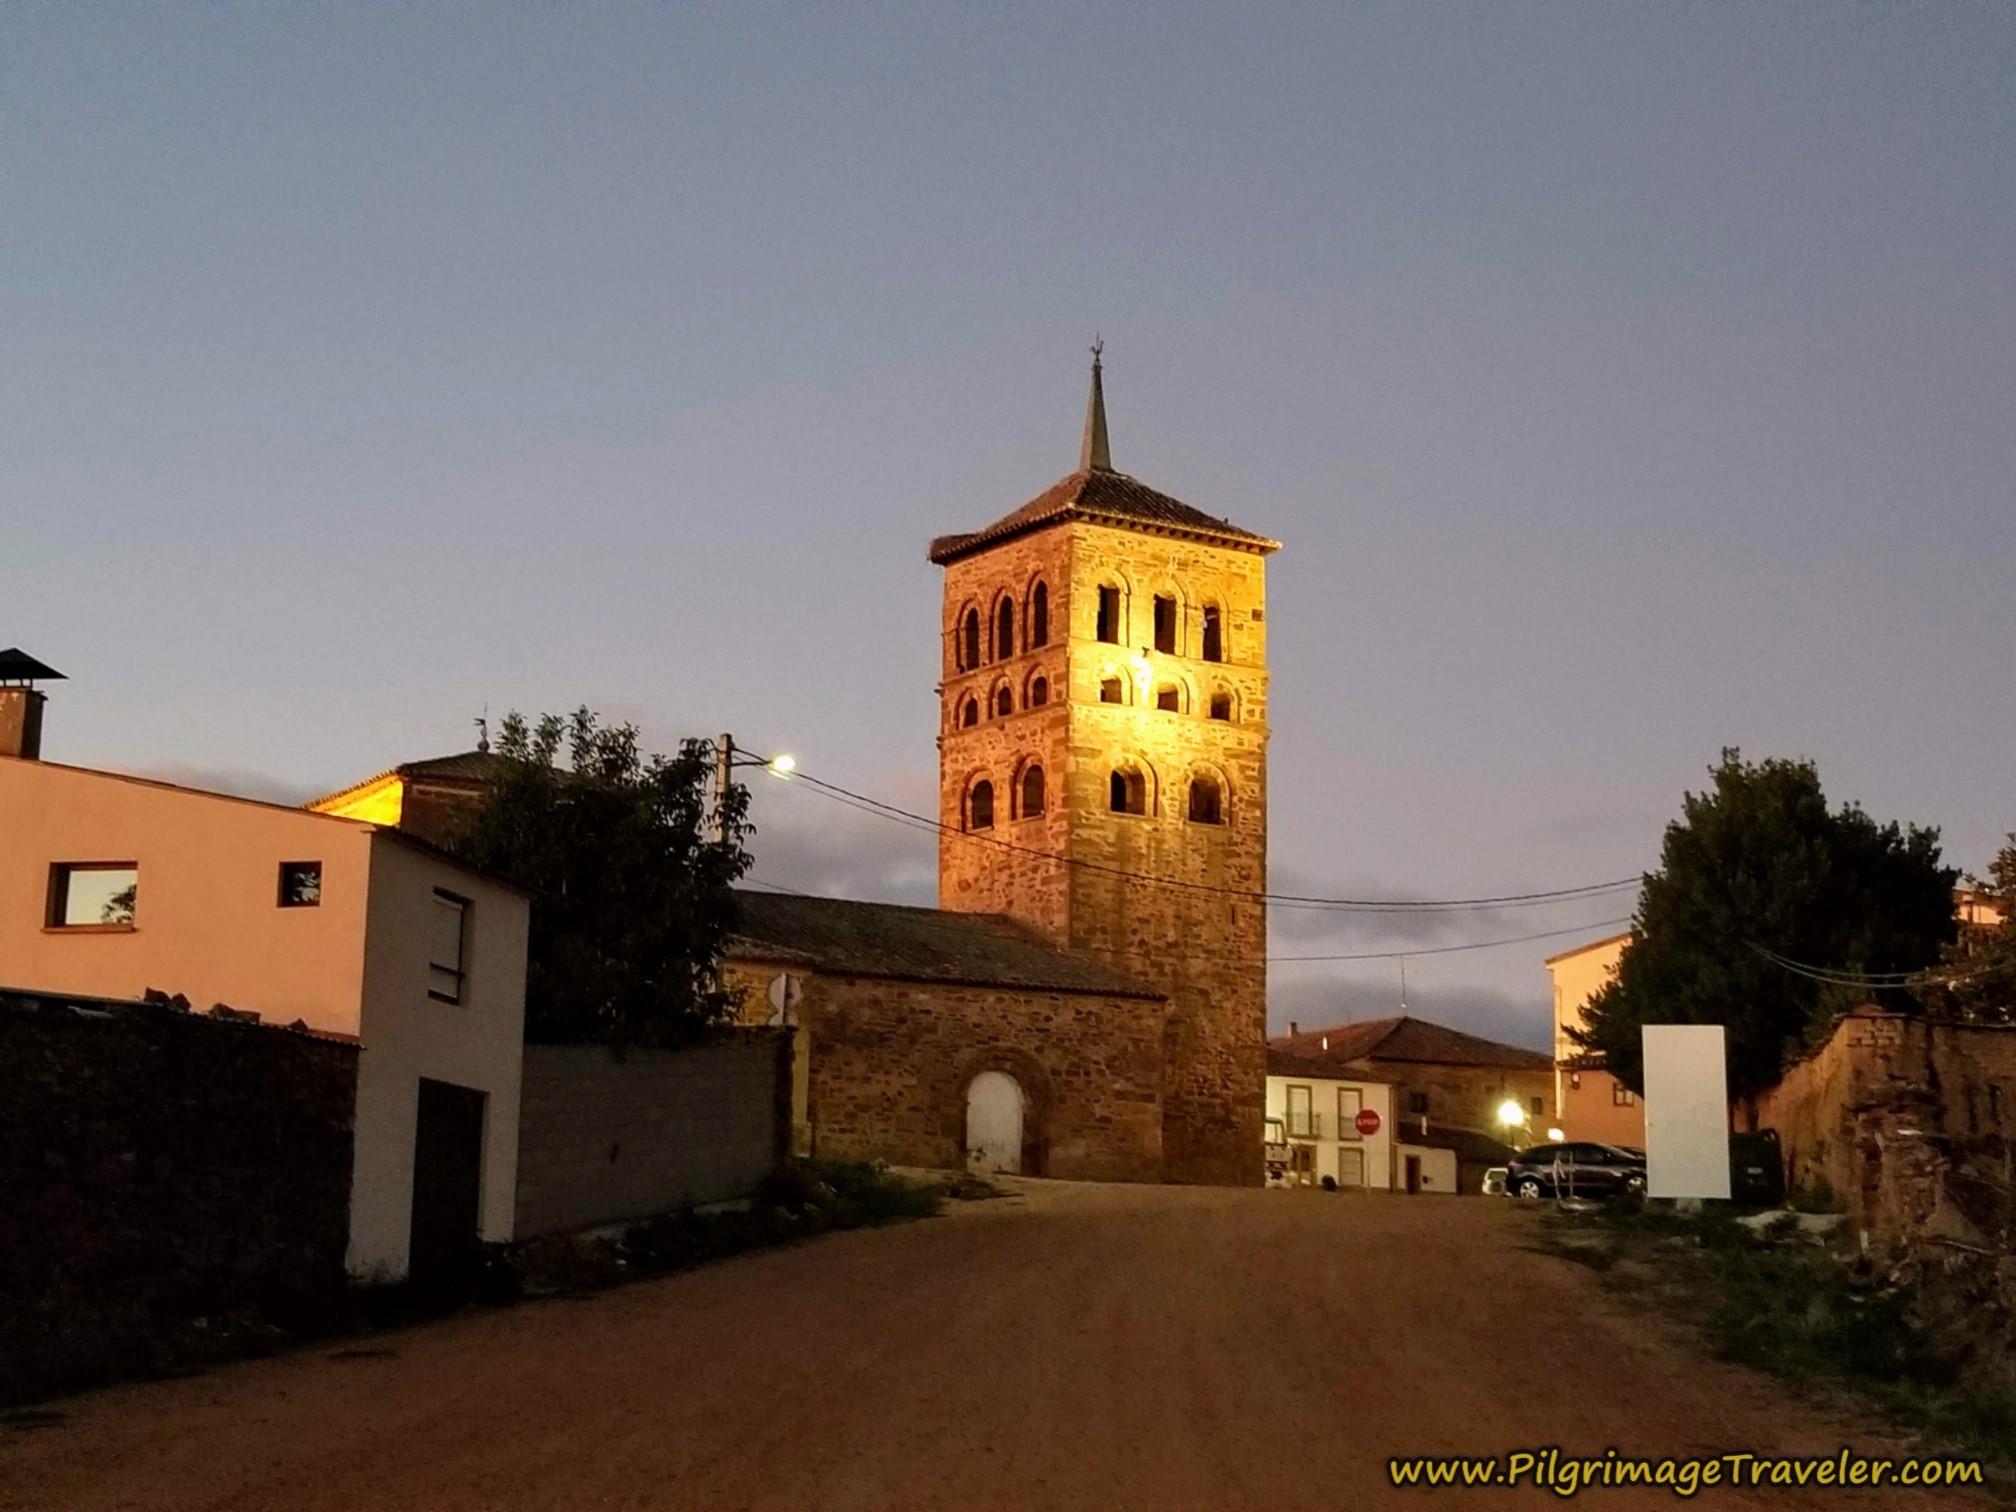 Day Two ~ Tábara to Santa Marta de Tera, 23 Kilometers (14.3 Miles)